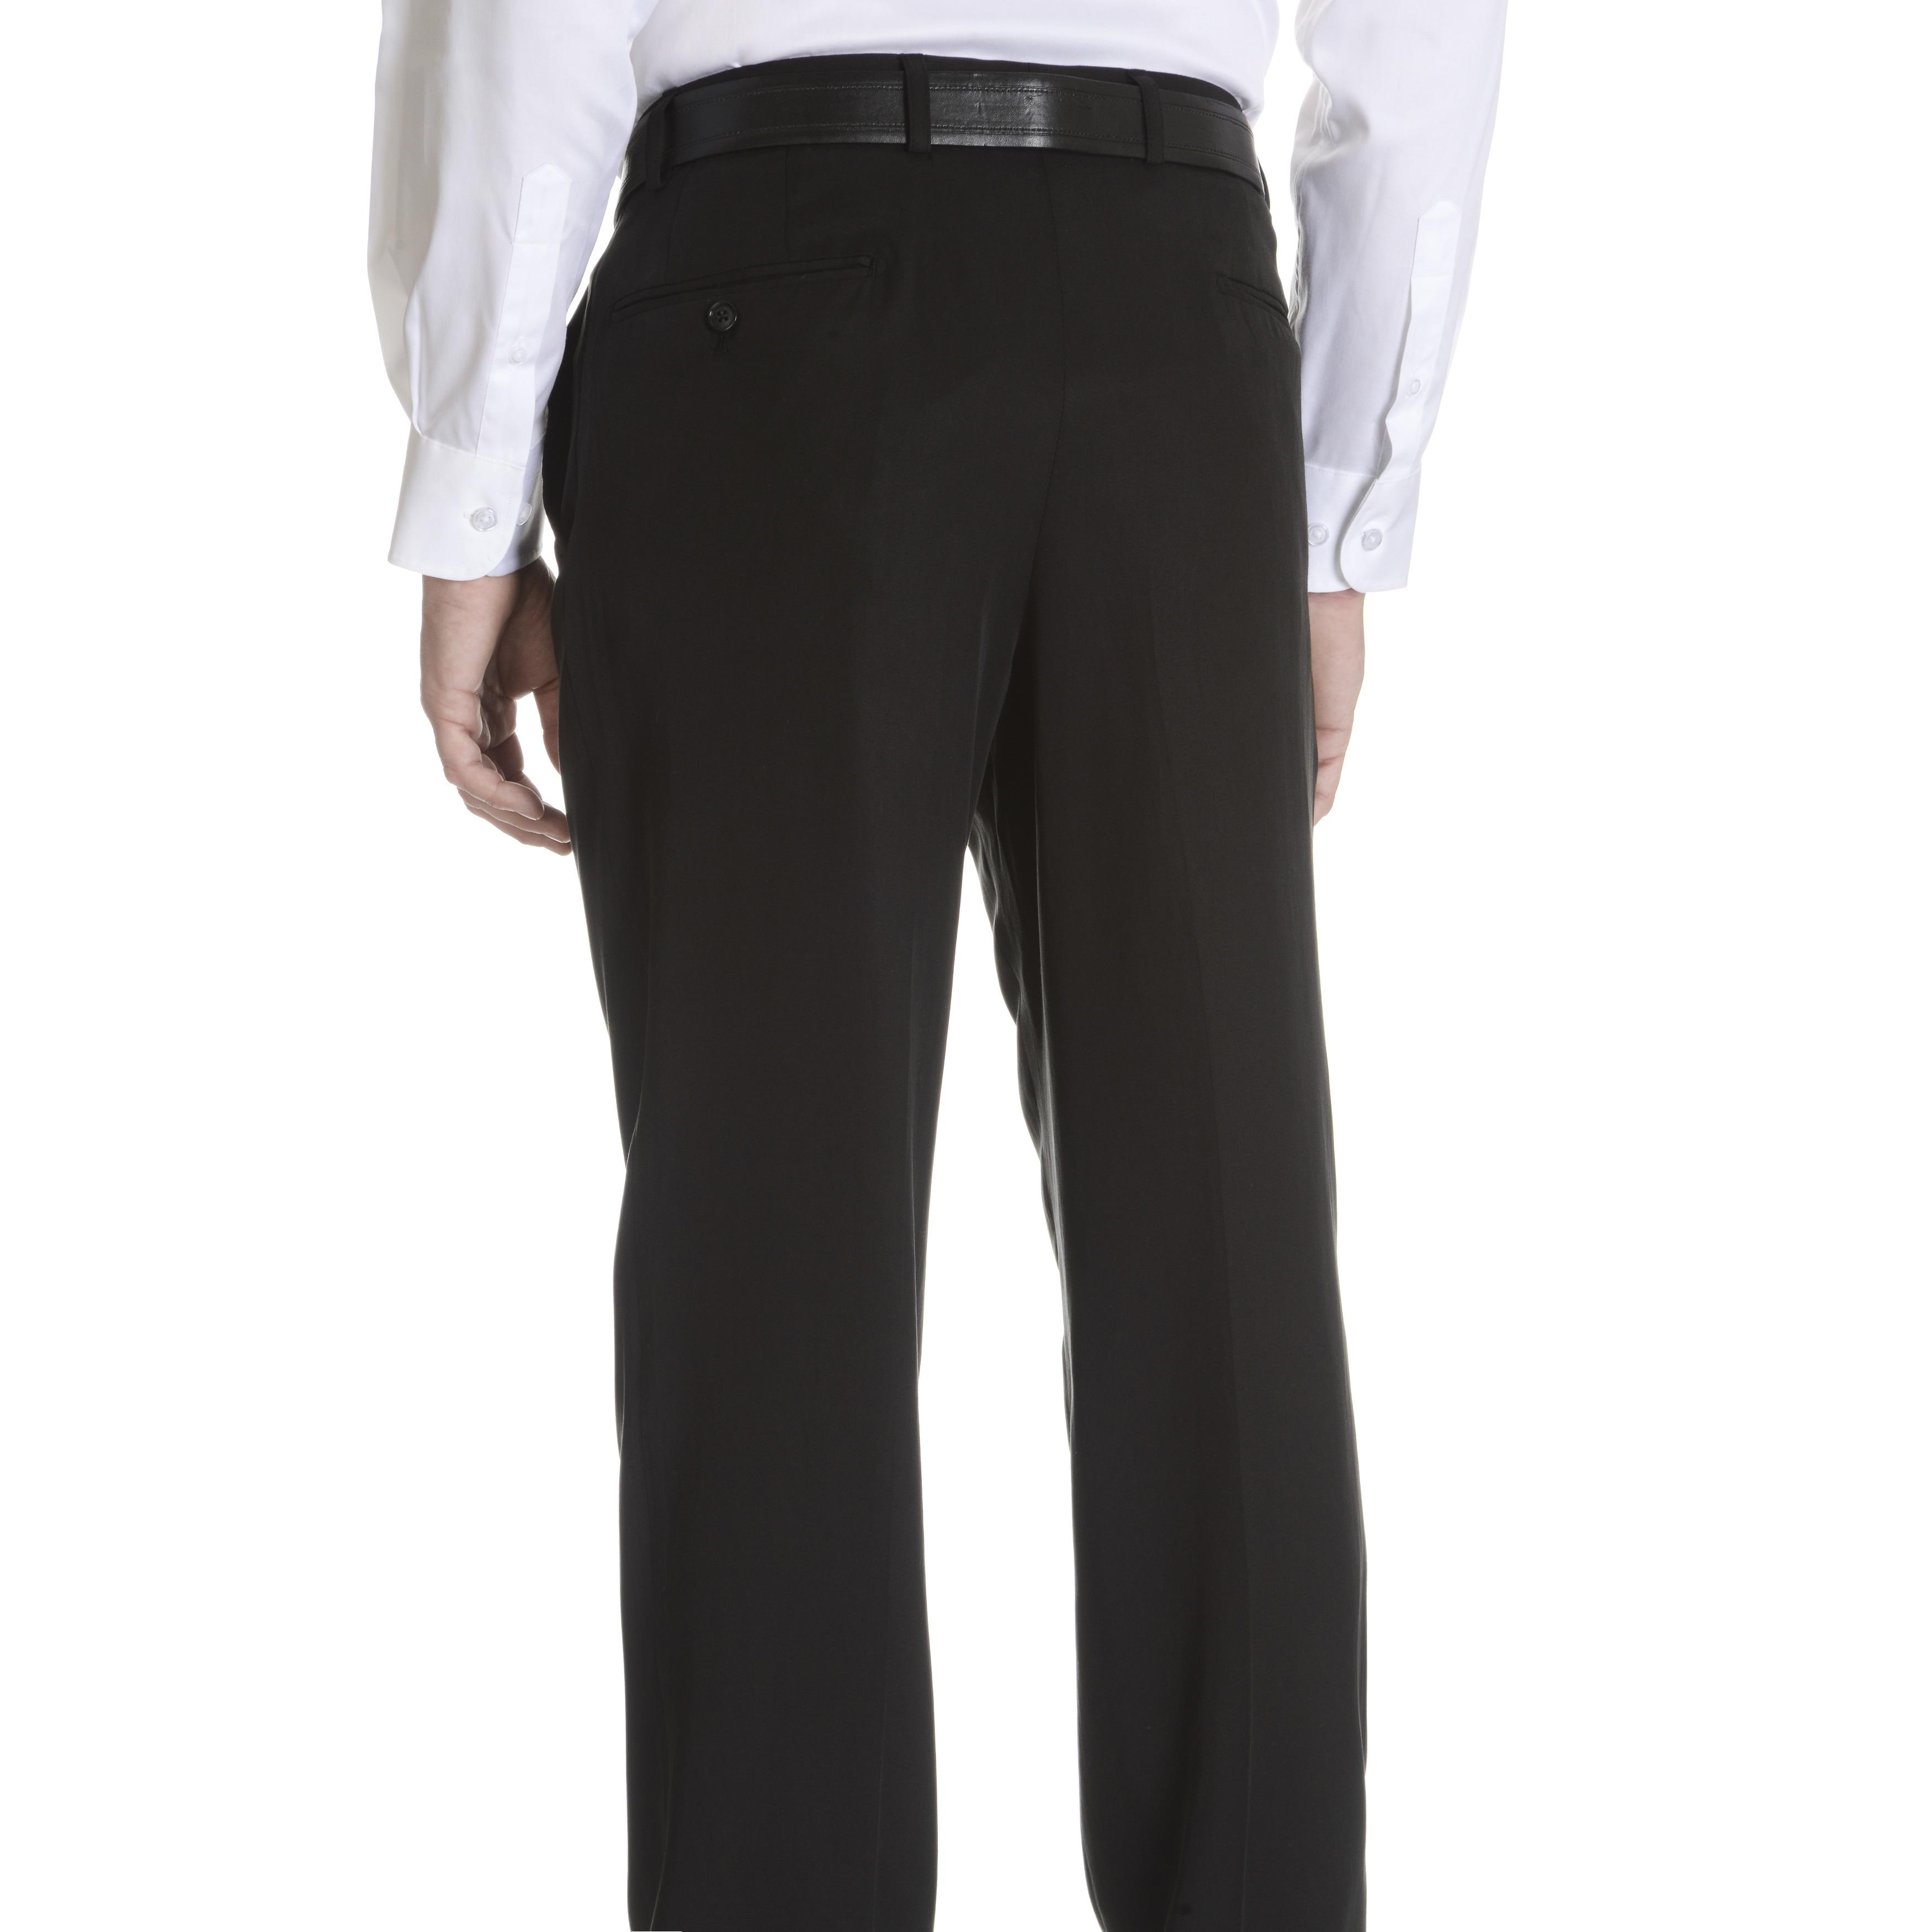 best service 809b5 0eff6 Daniel Hechter Men's Tencel Modern Fitted Suit Pants